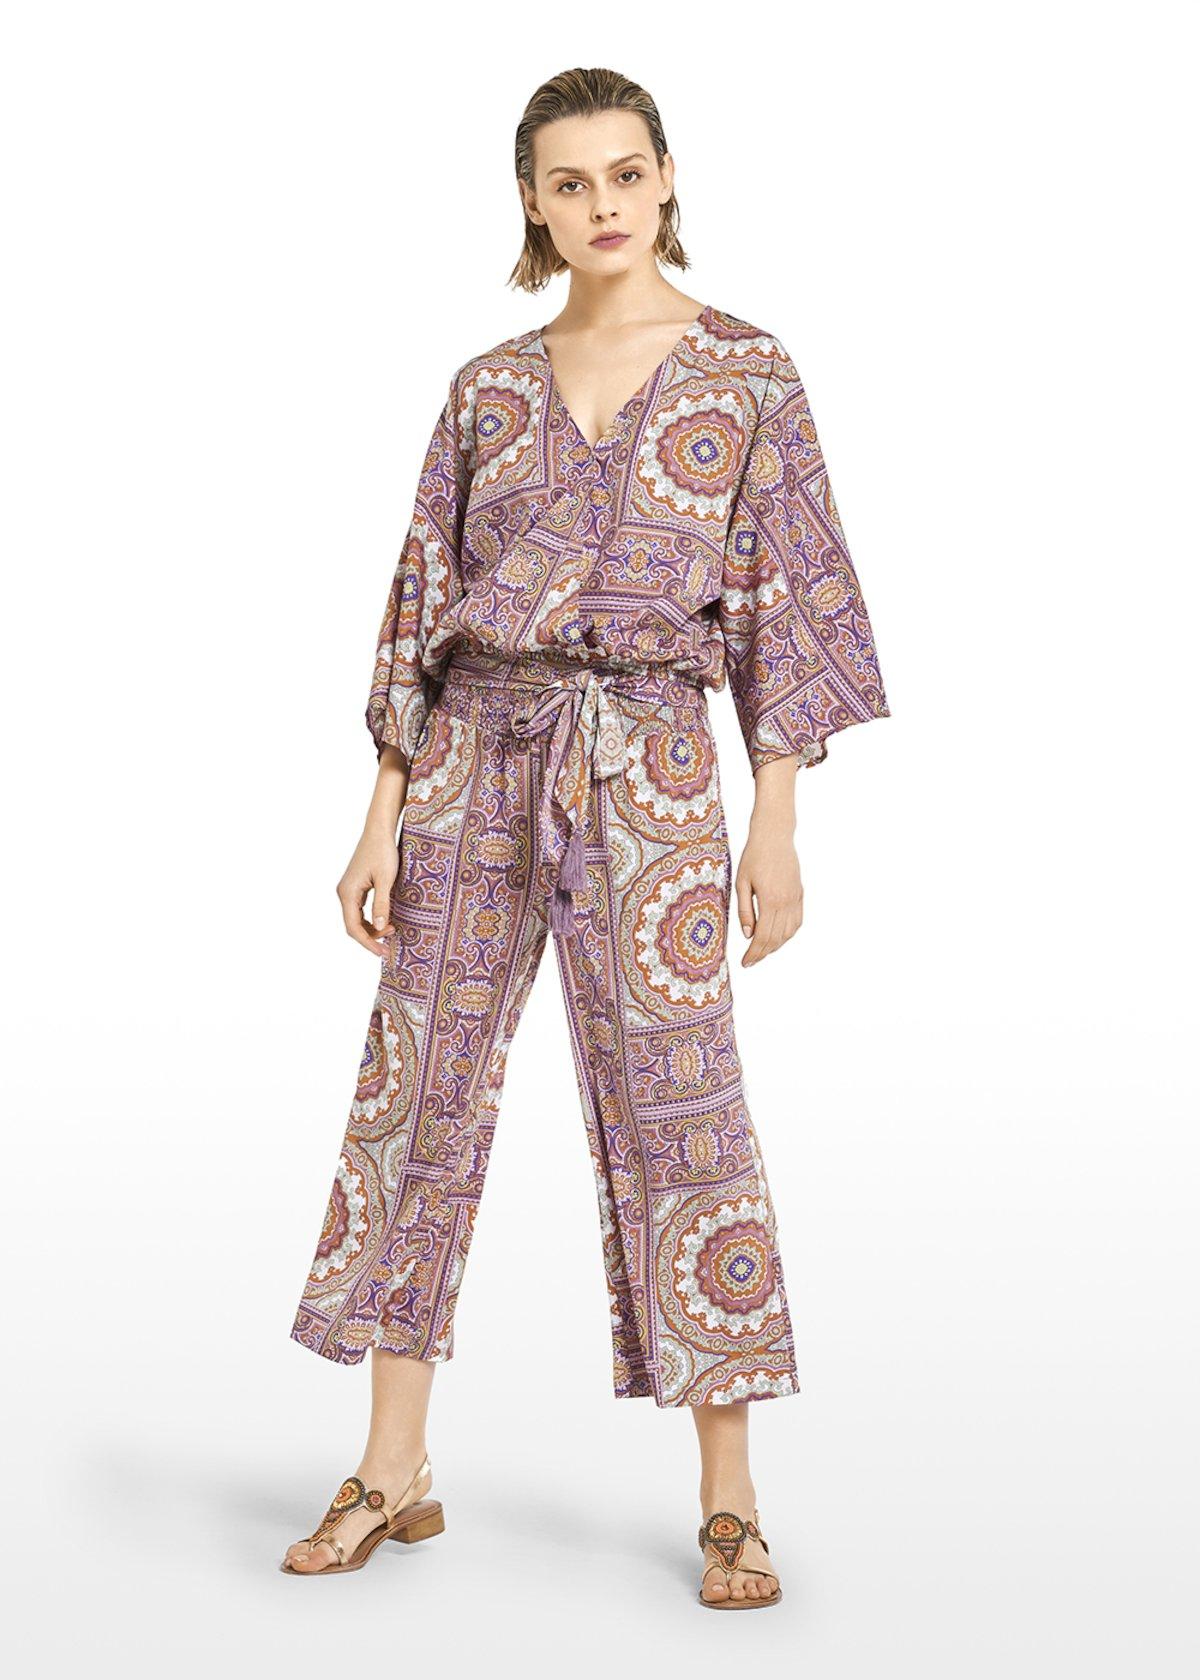 Penny Megan cashmere print trousers - Beige / Carota Fantasia - Woman